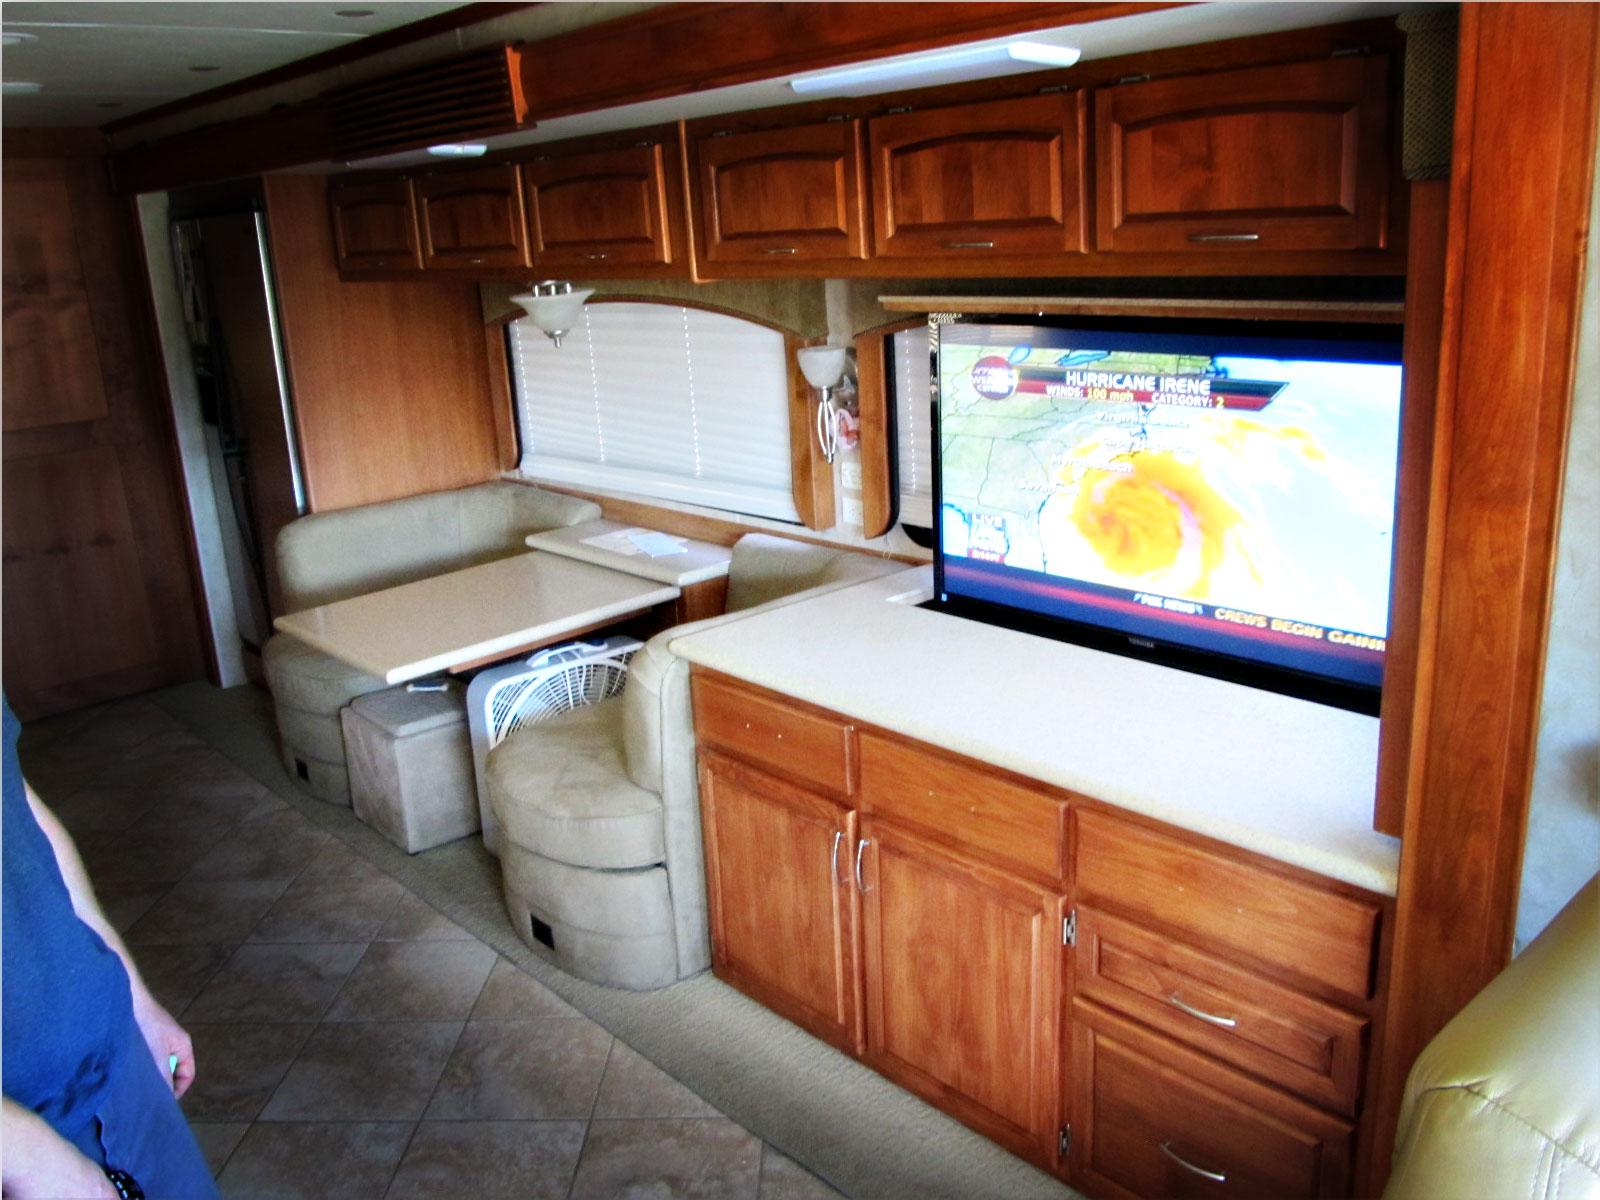 rv cabinets and storage systems rv kitchen cabinets Custom Overhead Storage